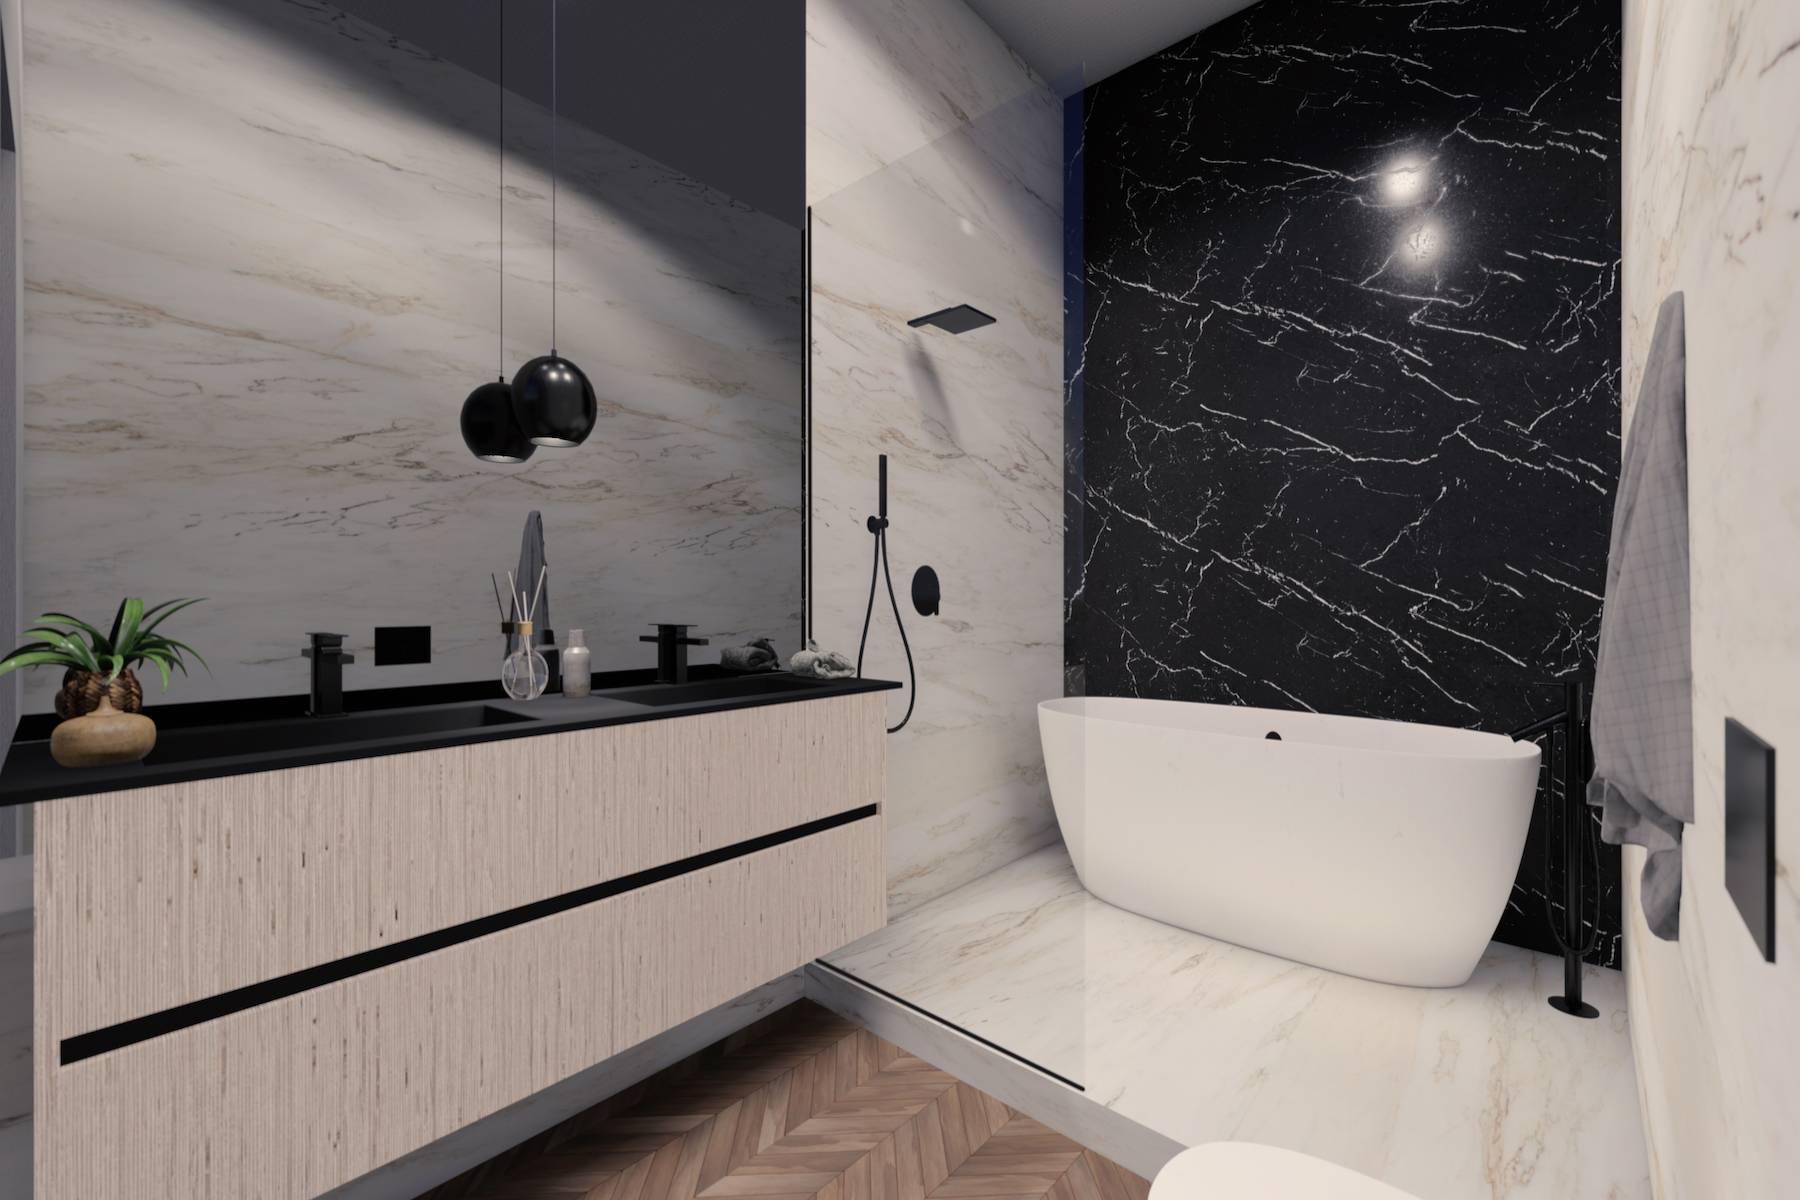 Luxus-Wohnungen am Meer in Viareggio - 12